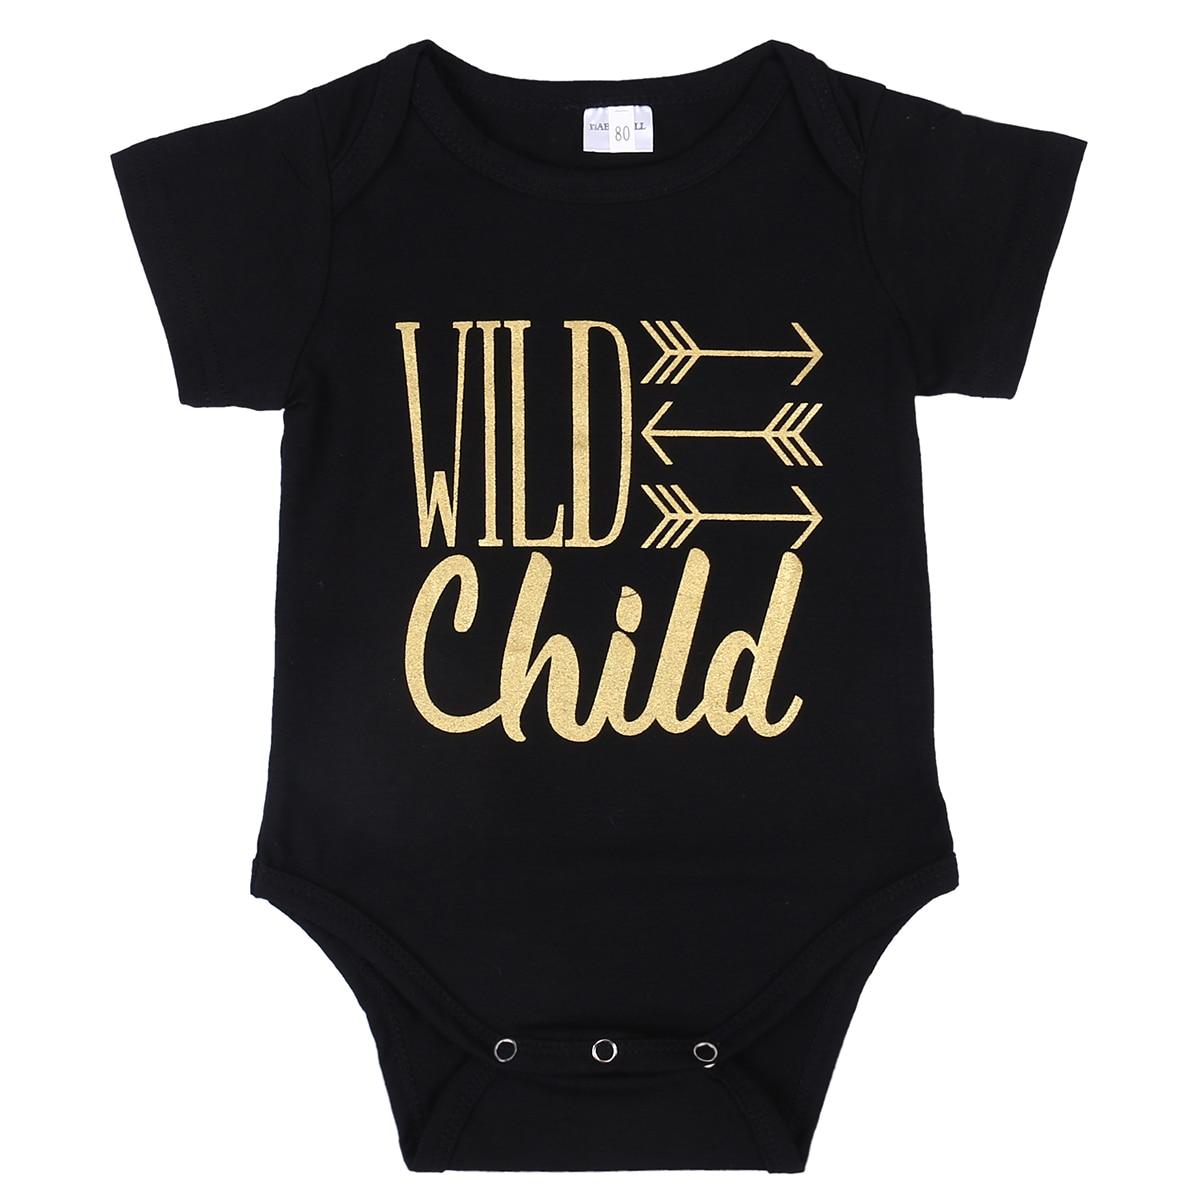 0 18m Newborn Baby Bodysuit Clothes Casual Infant Bebes Wild Child